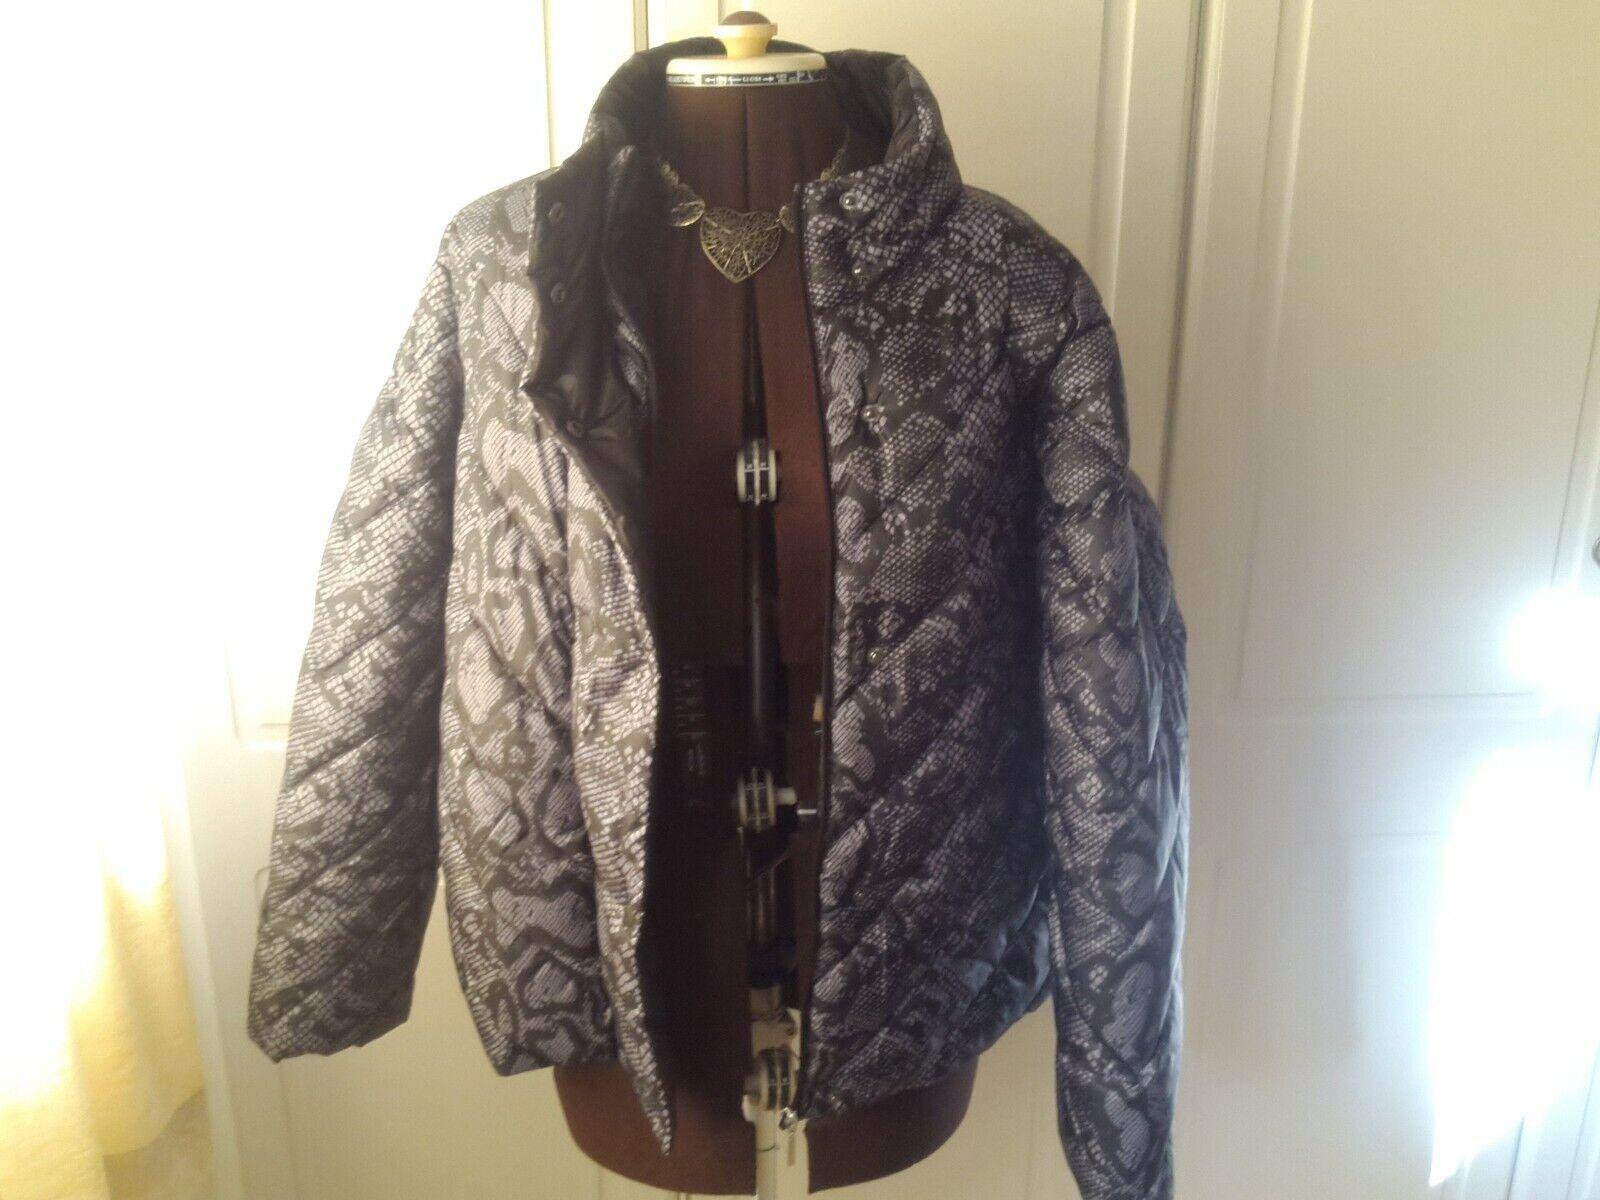 BNWOT super light snake print padded jacket from Principles - size 20